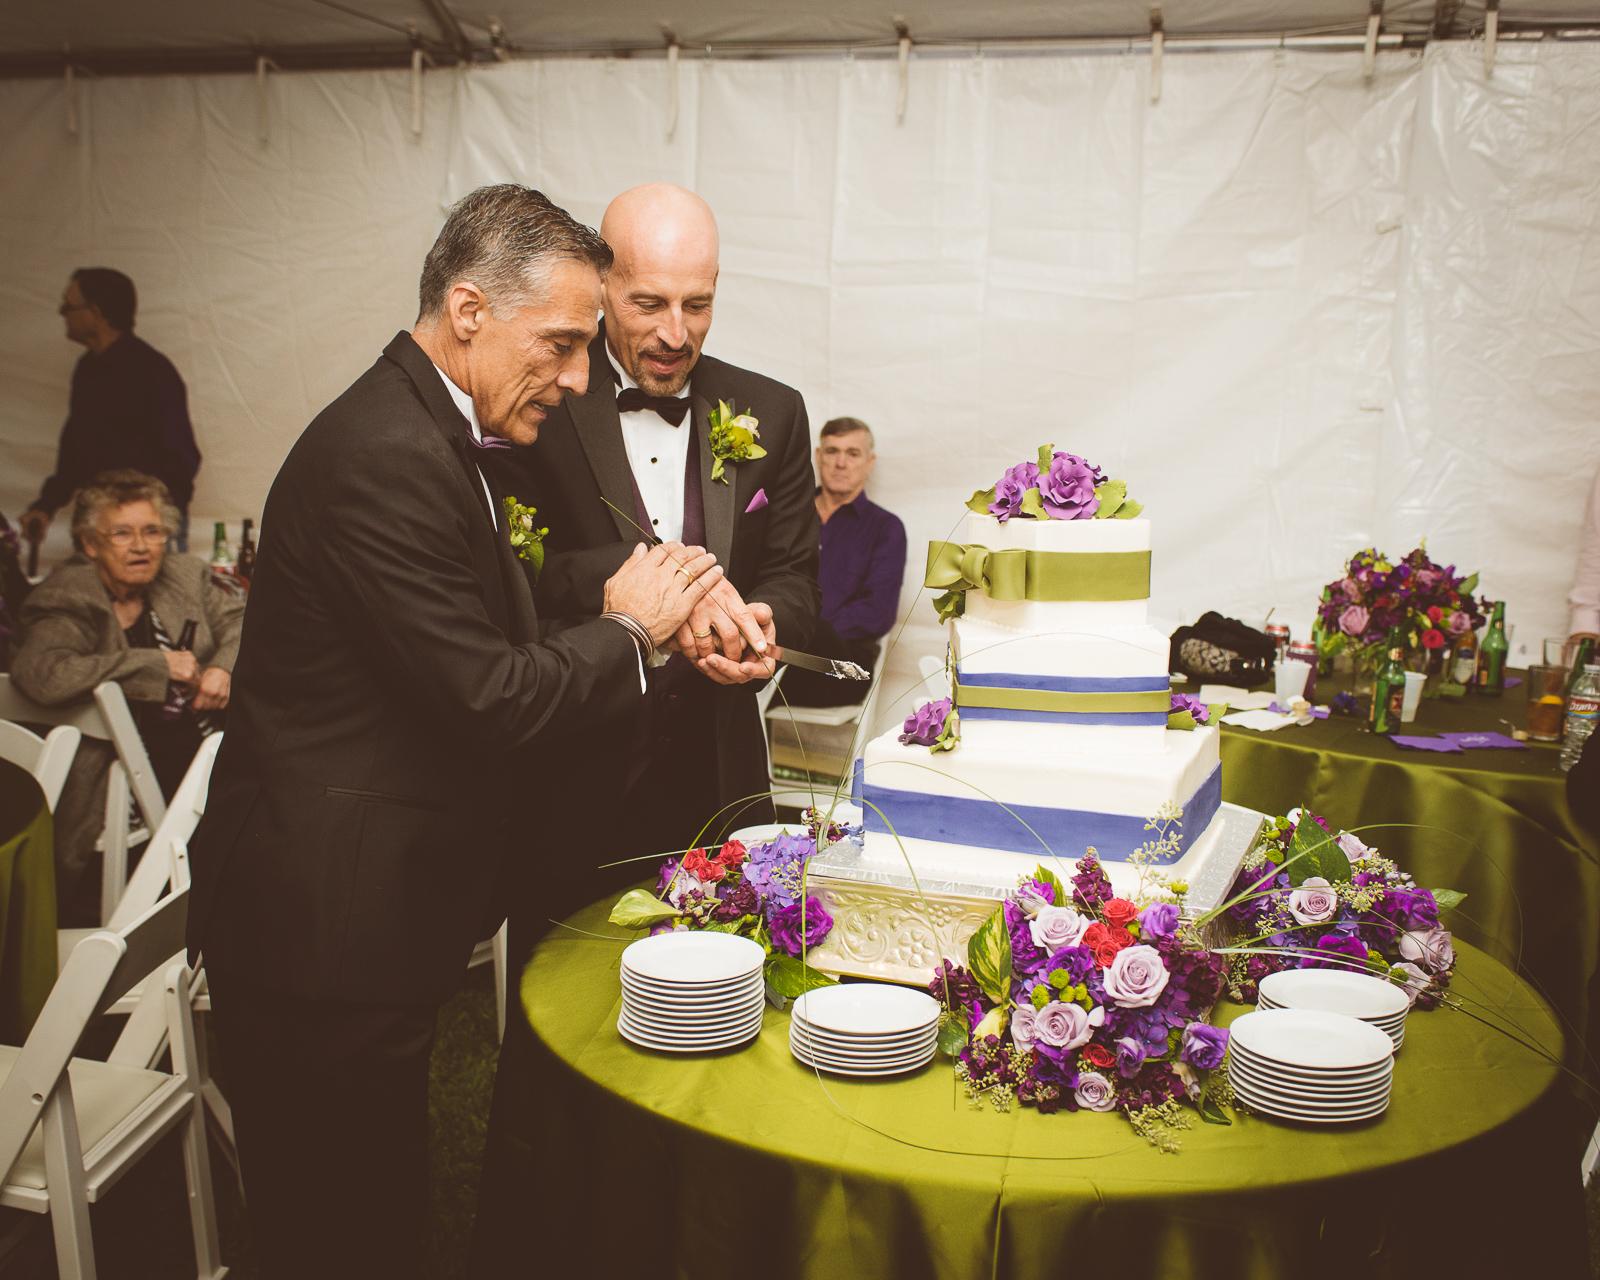 Michael-Napier-Weddings-Ludwig-Guilbeau Wedding-20 (37).jpg